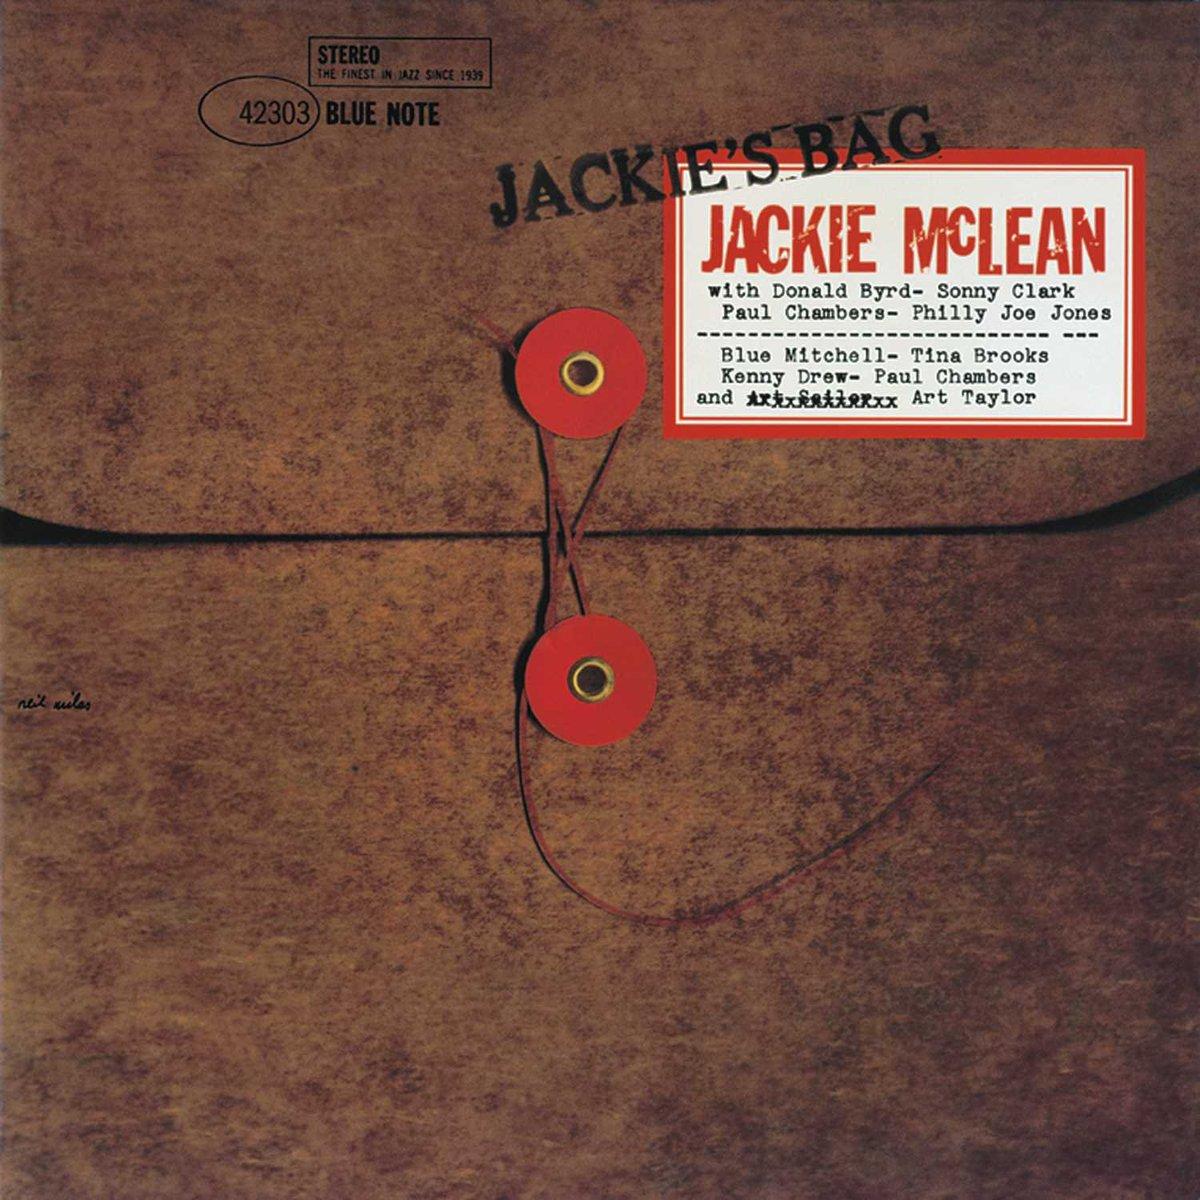 60 years ago #OTD alto saxophonist #JackieMcLean was in Rudy Van Gelder's Hackensack studio recording tracks that would be released on his album 'Jackie's Bag' w/ Donald Byrd (trumpet), Sonny Clark (piano), Paul Chambers (bass) & Philly Joe Jones (drums)  https://t.co/3PrgvJ7GMt